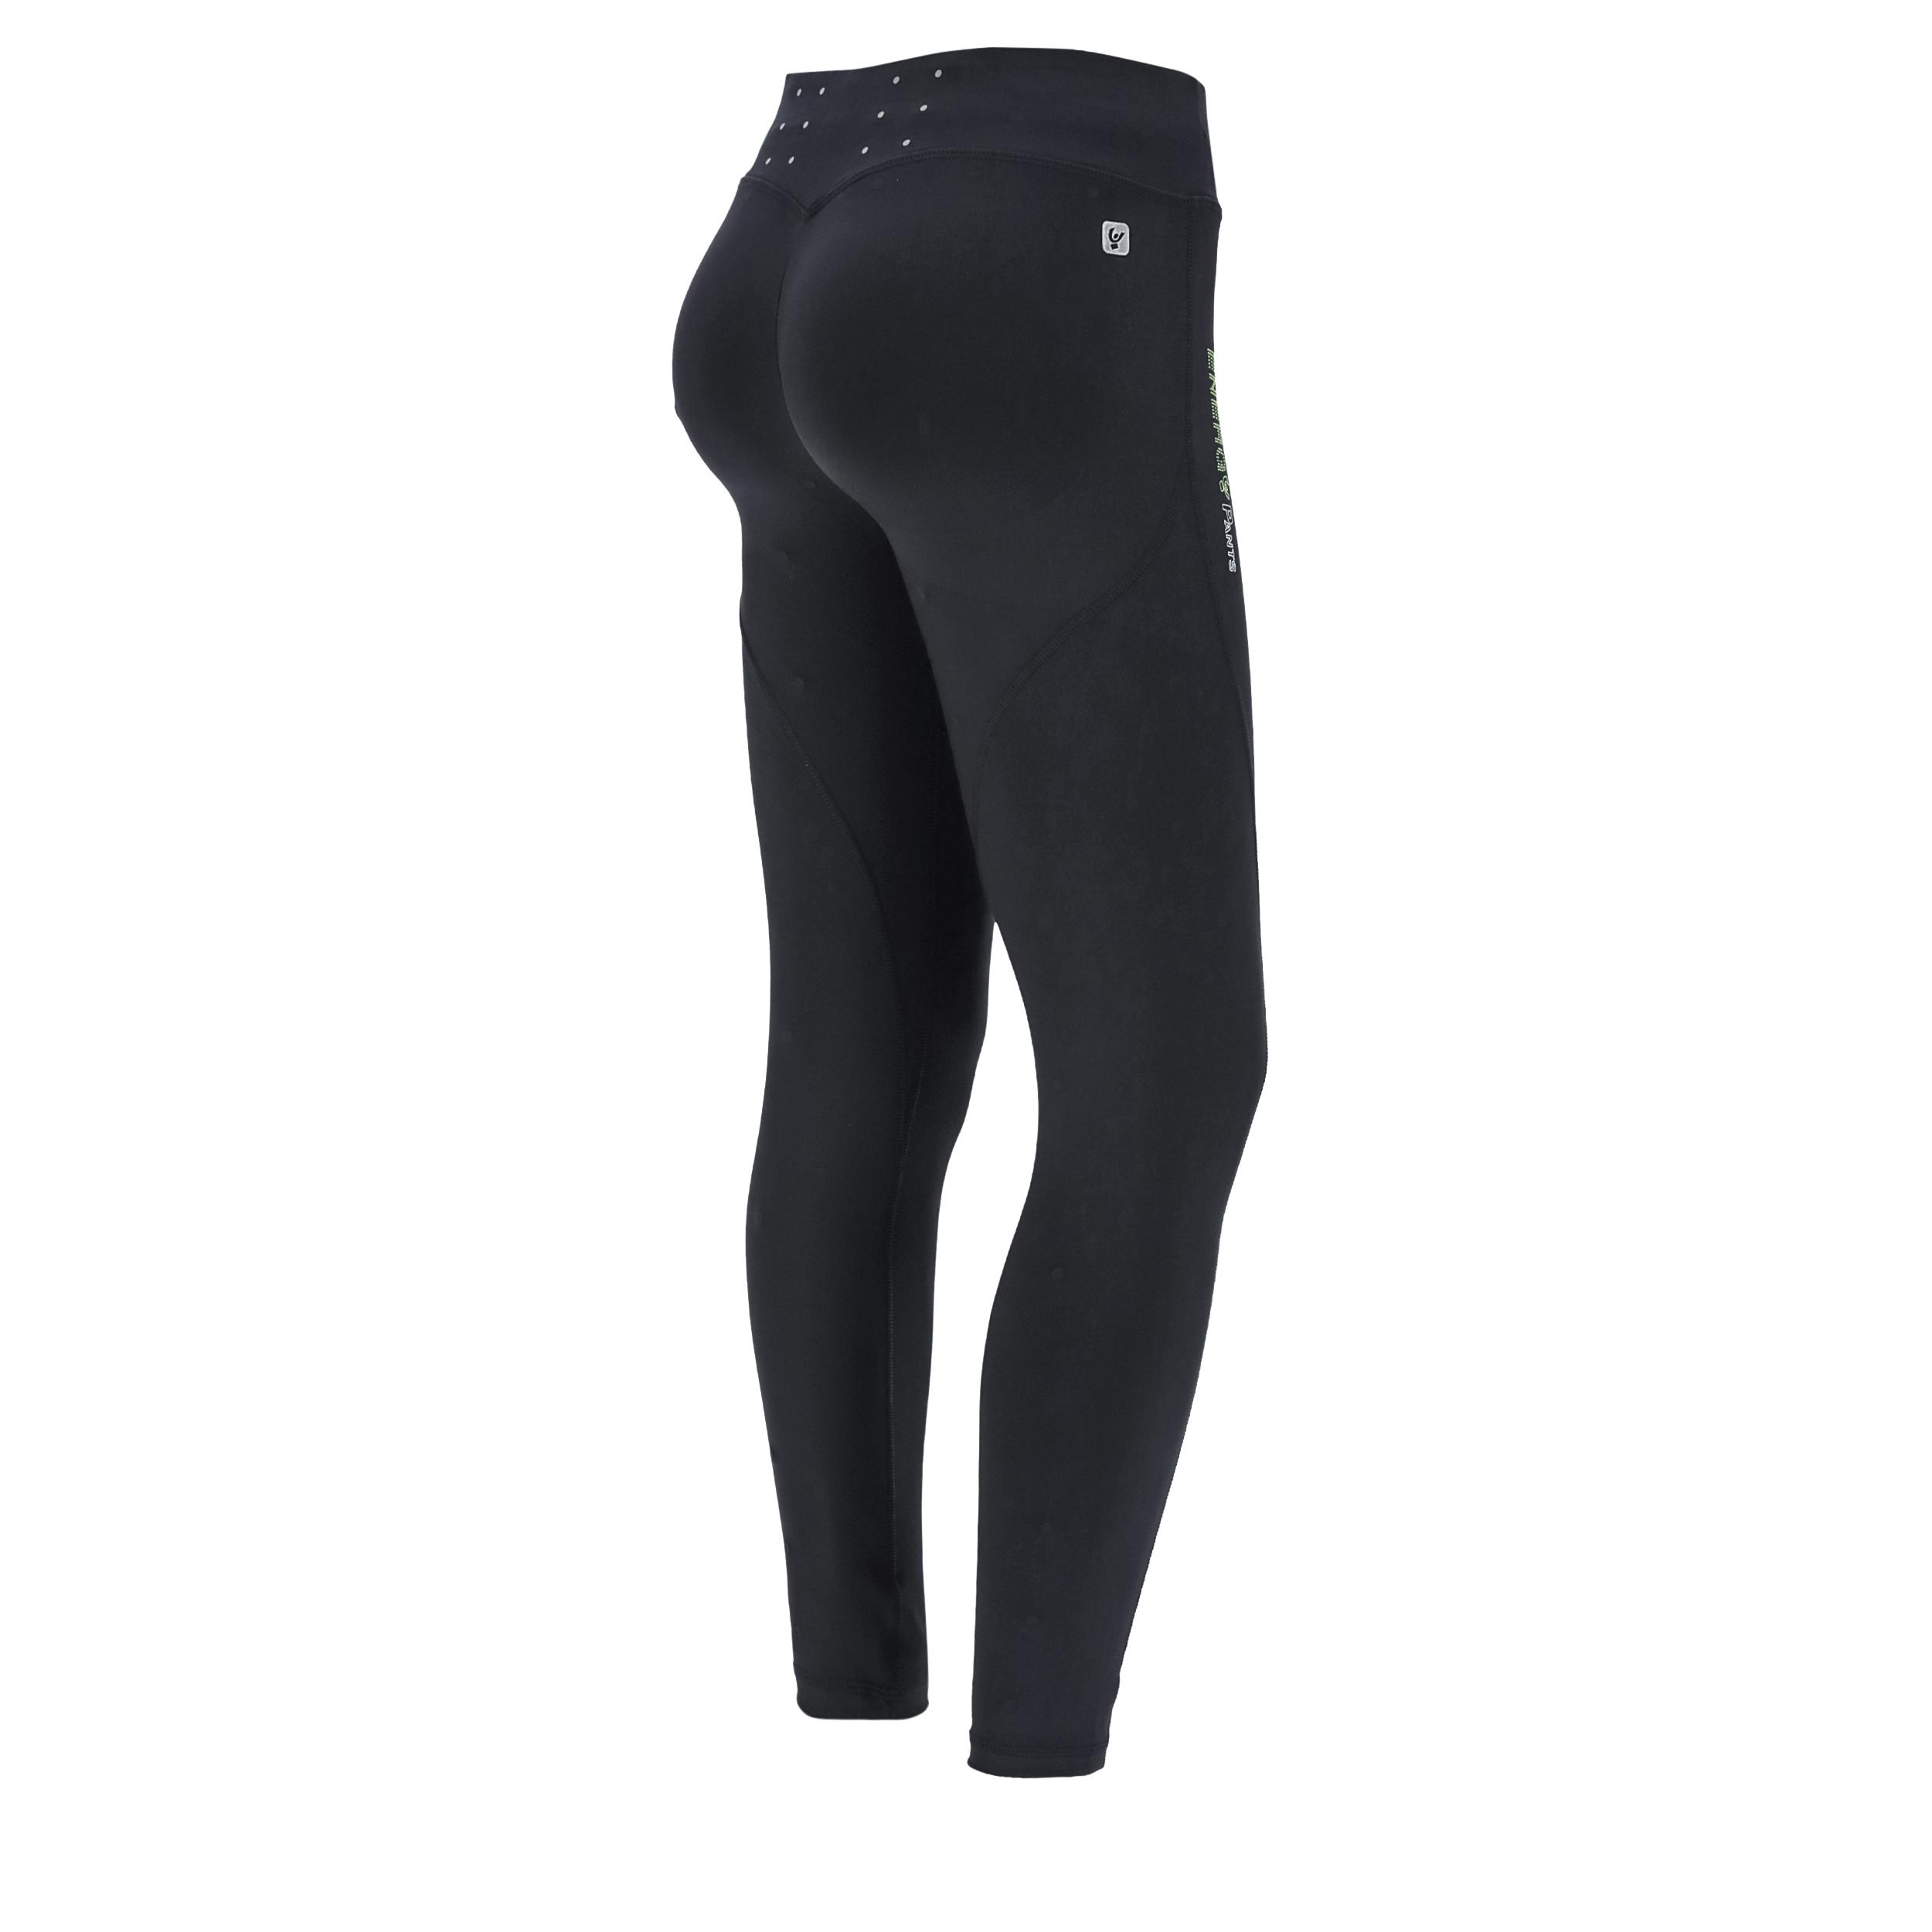 Leggings Freddy Energy Pants® WR.UP® Sport modellanti 7/8